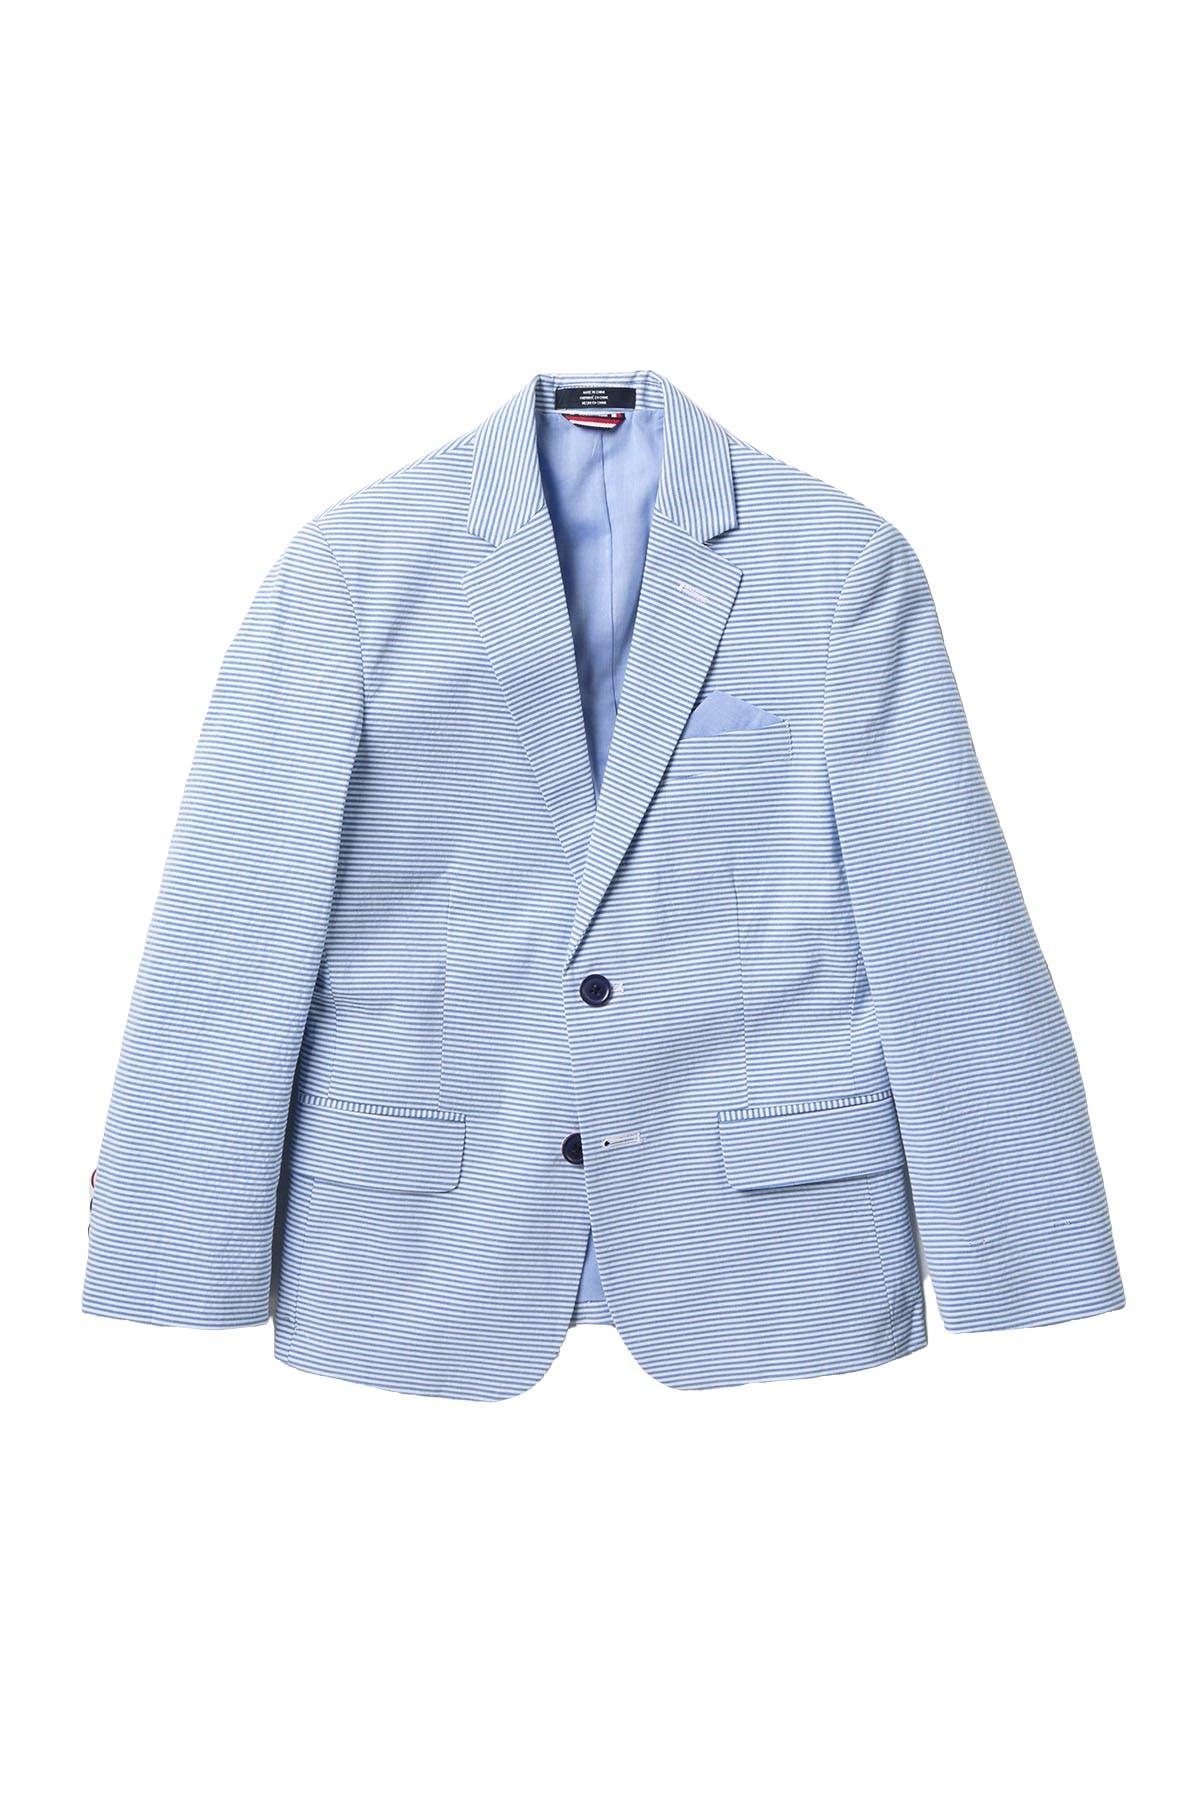 Image of Tommy Hilfiger Horizontal Seersucker Stripe Jacket